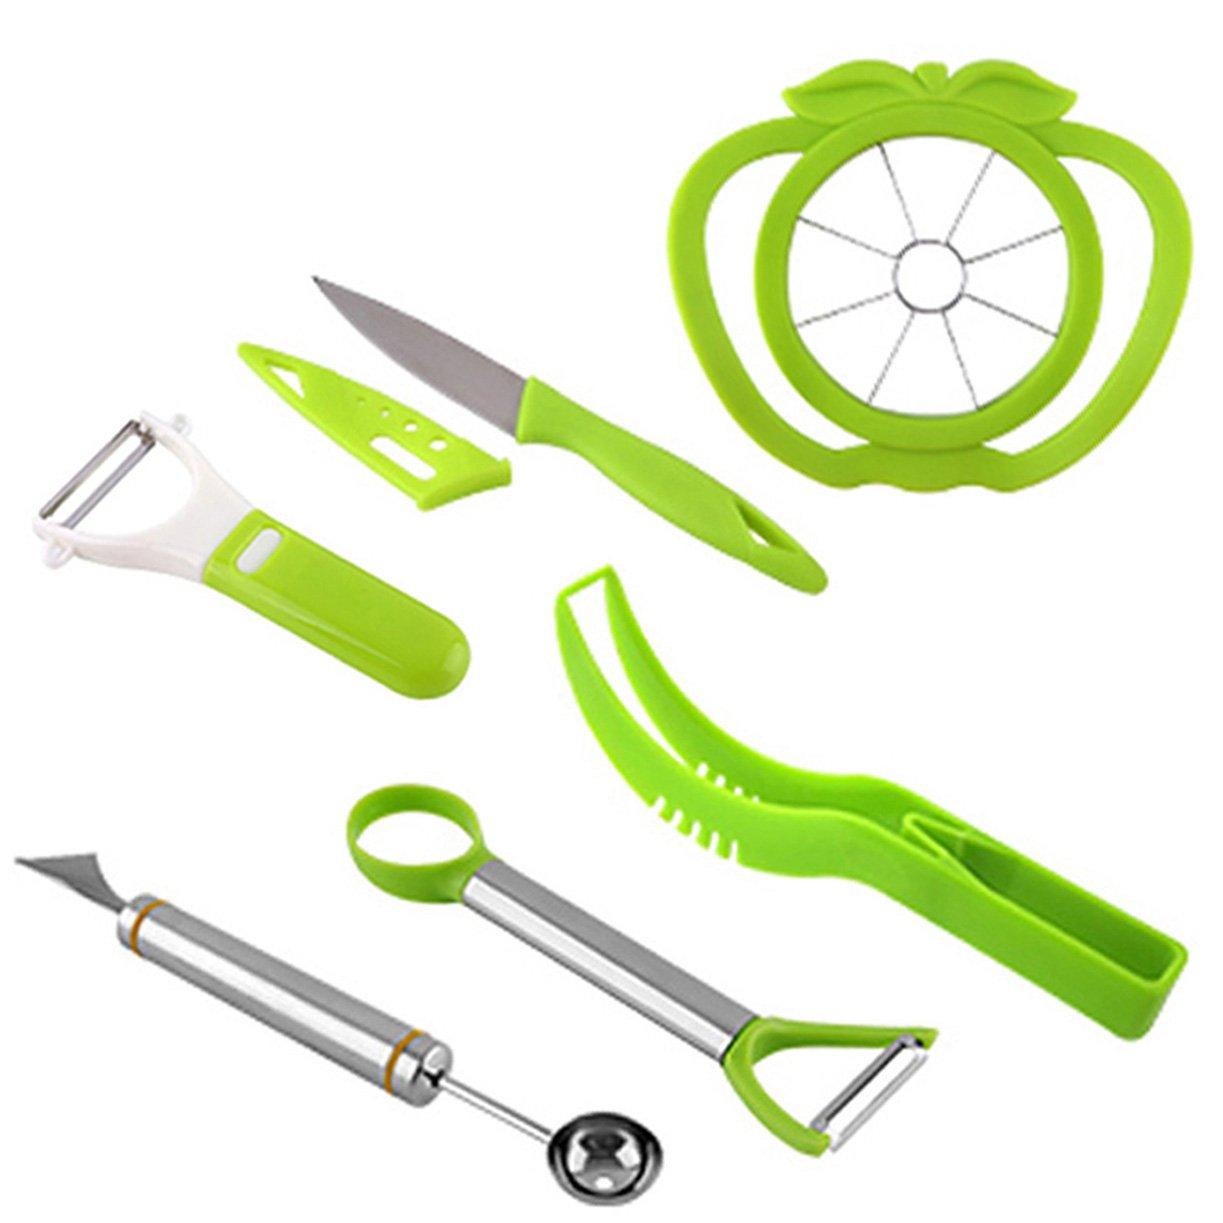 NewFerU Plastic Stainless Steel Kitchen Fruit Carving Tool Set Garnishing Melon Baller Scoop Spoon Knife Shapes Kit With Apple Cutter Corer, Watermelon Slicer Cutter Server and Peeler Pack of 6